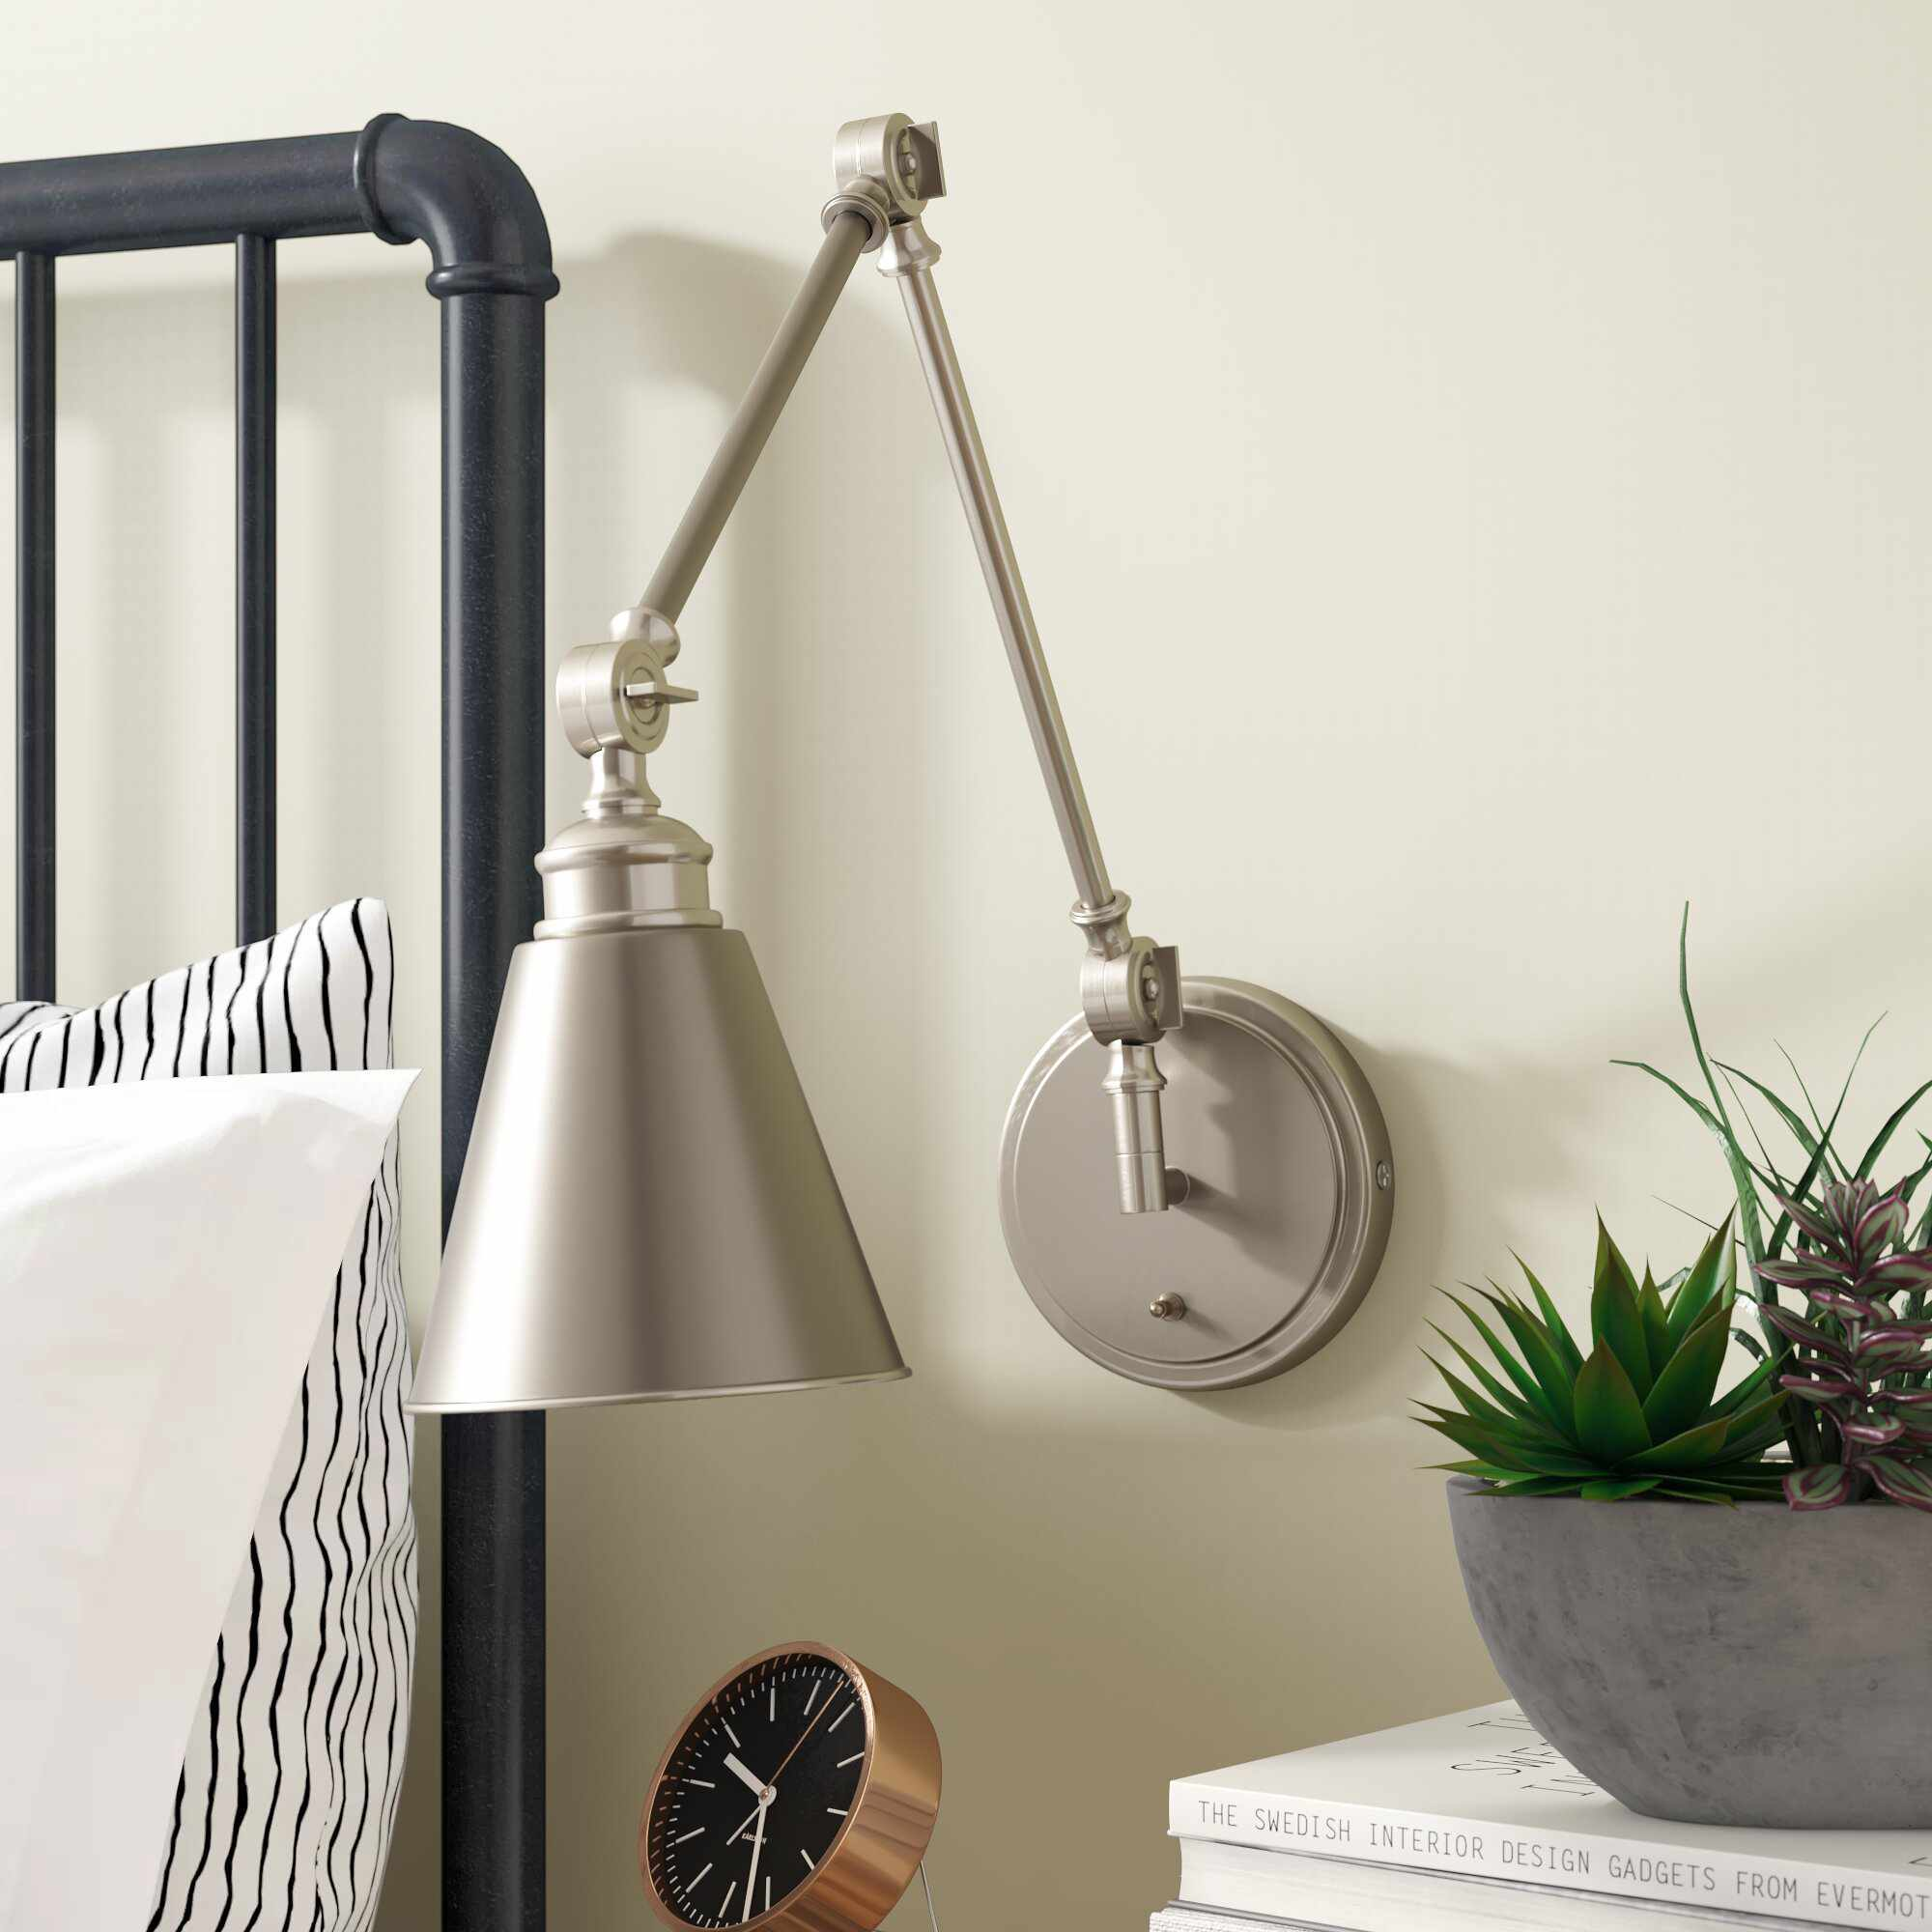 Beckham 1 - Light Plug-in Swing Arm